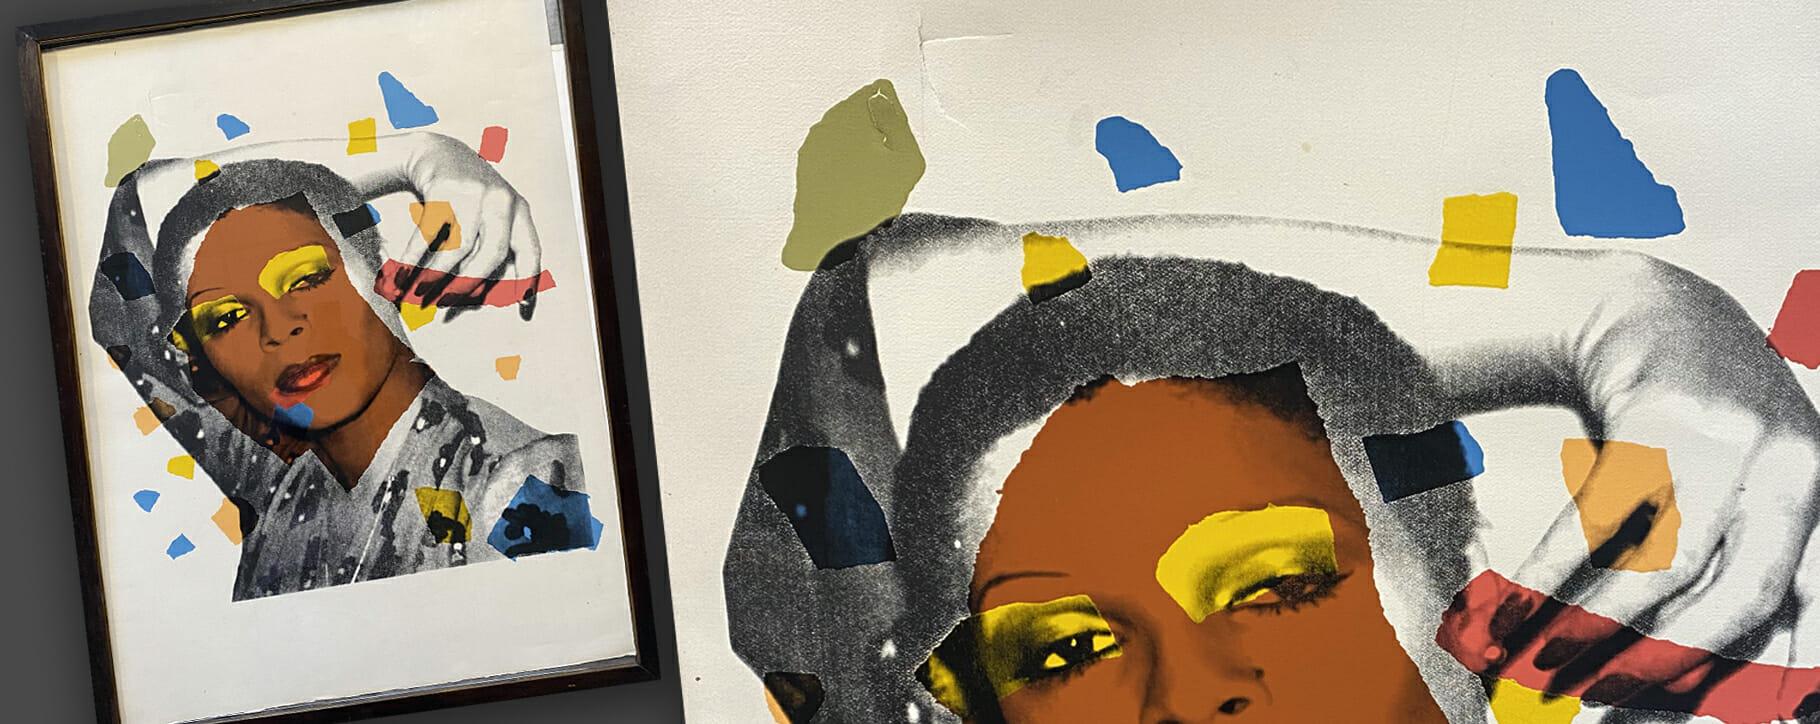 Warhol Restoration